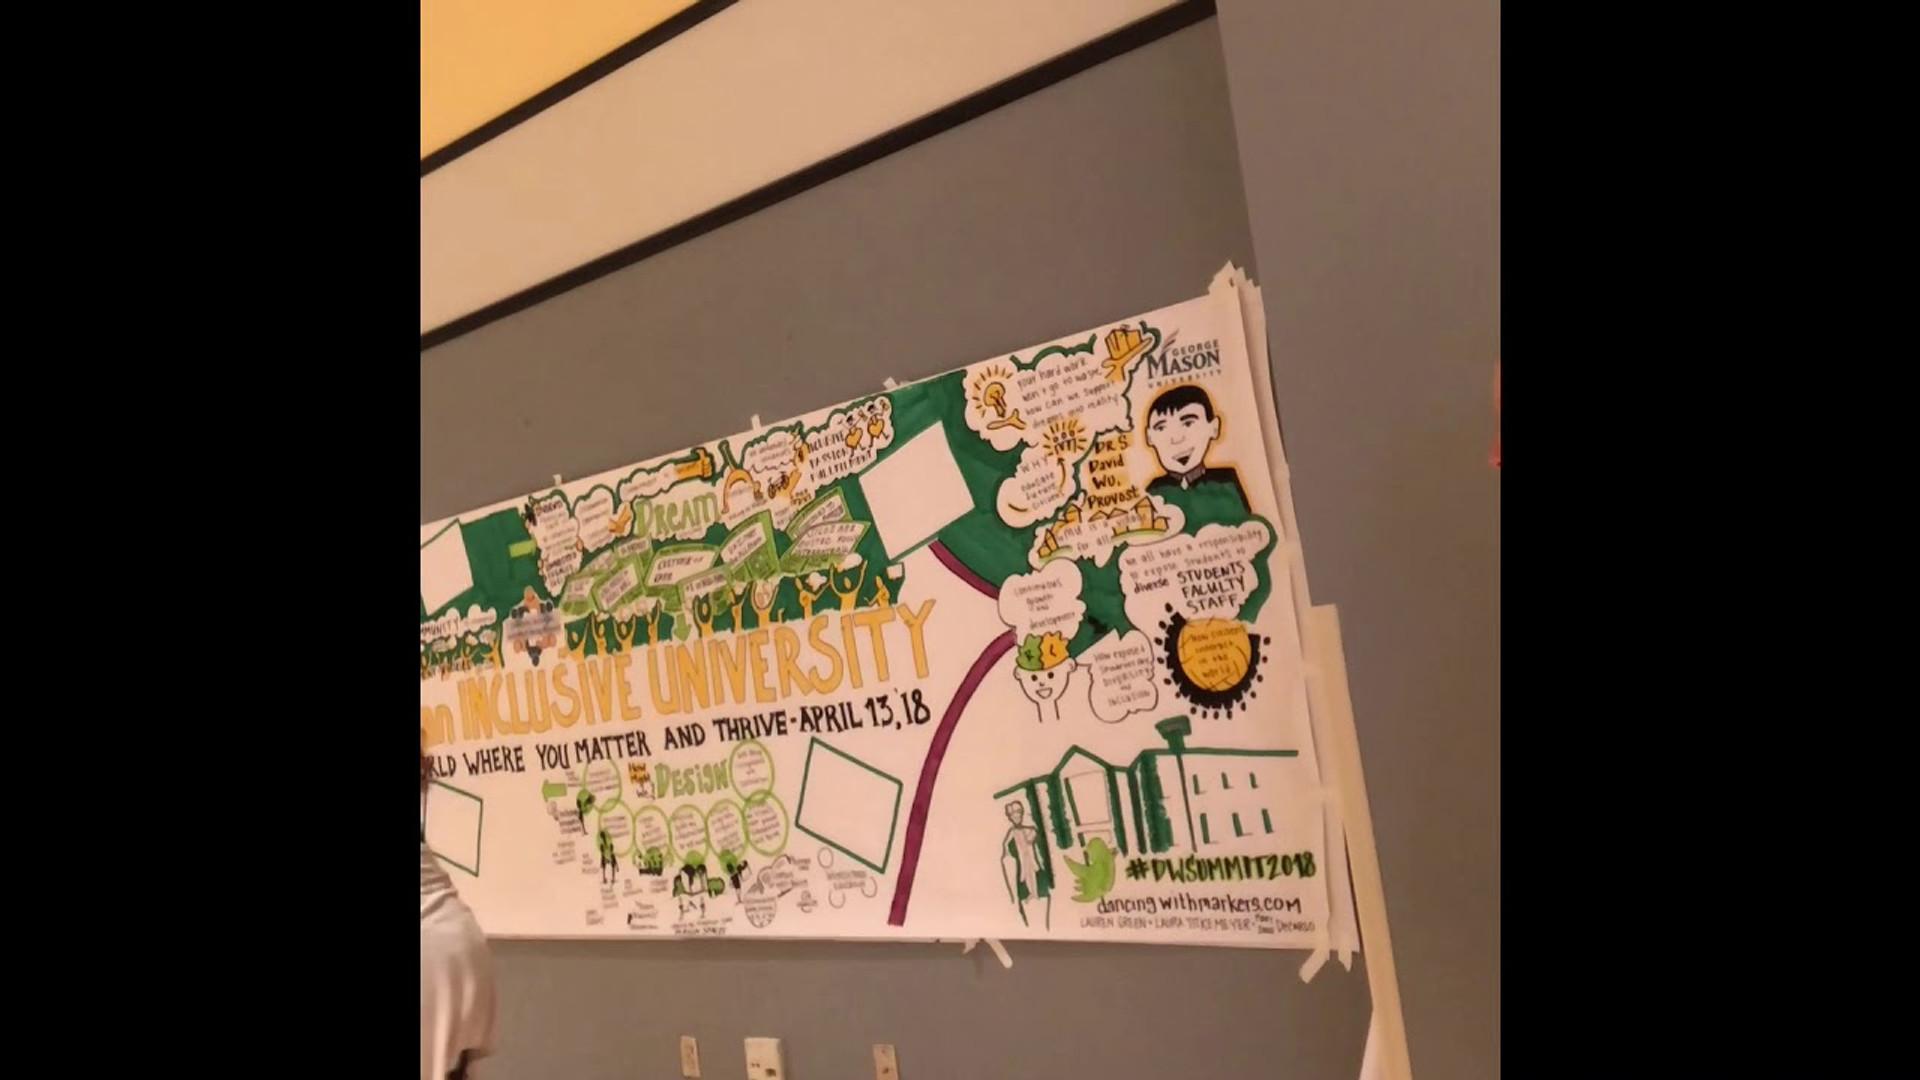 George Mason University Appreciative Inquiry Summit